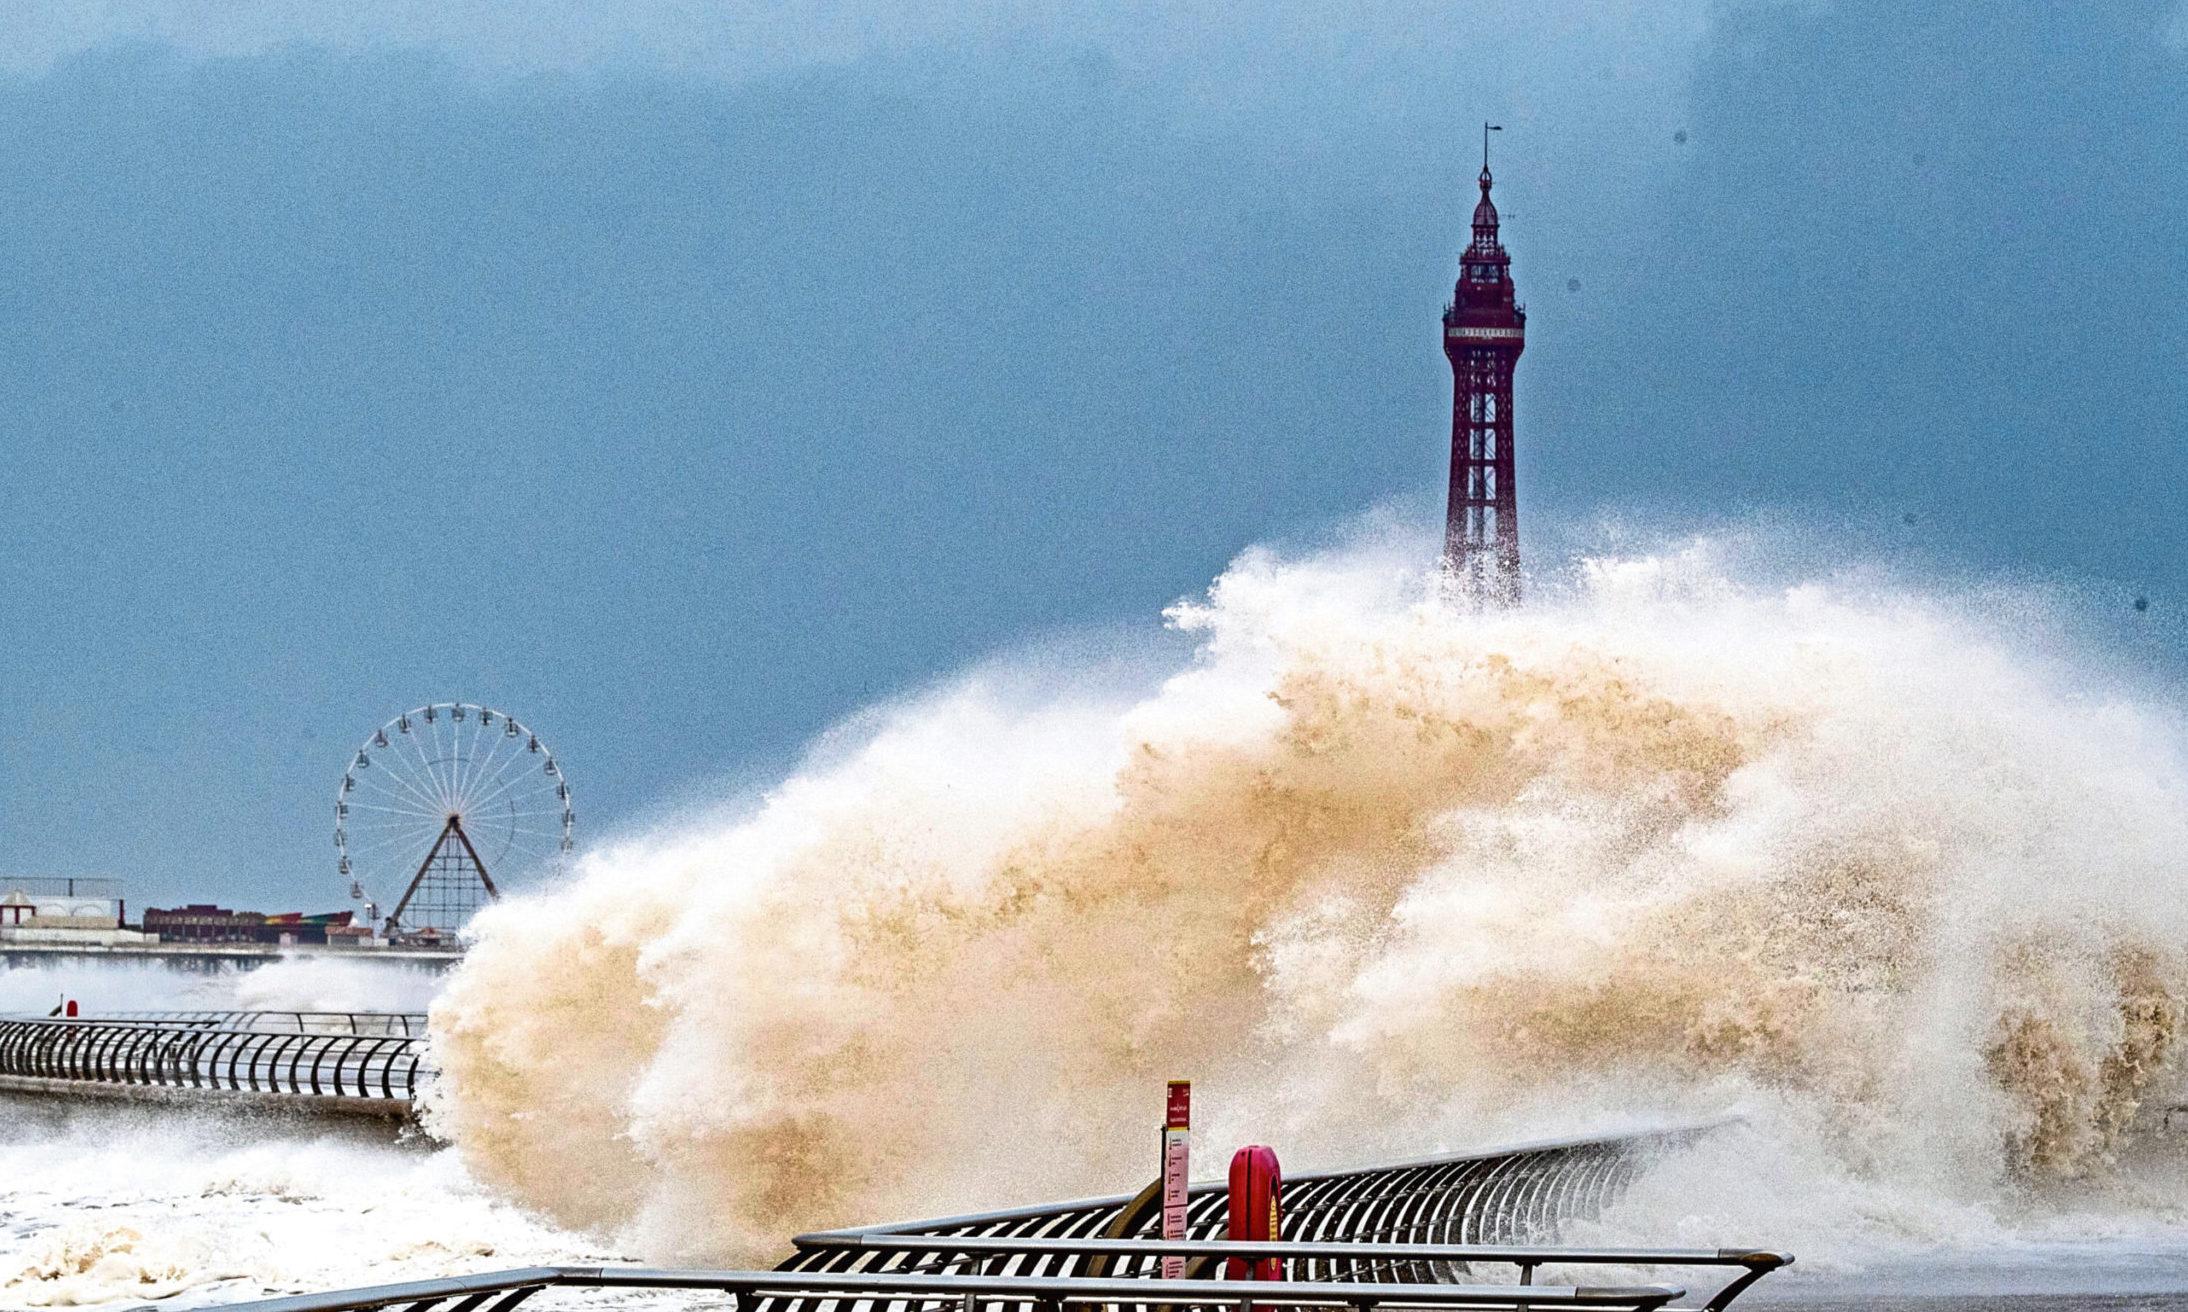 Storm Ciara batters Blackpool waterfront.